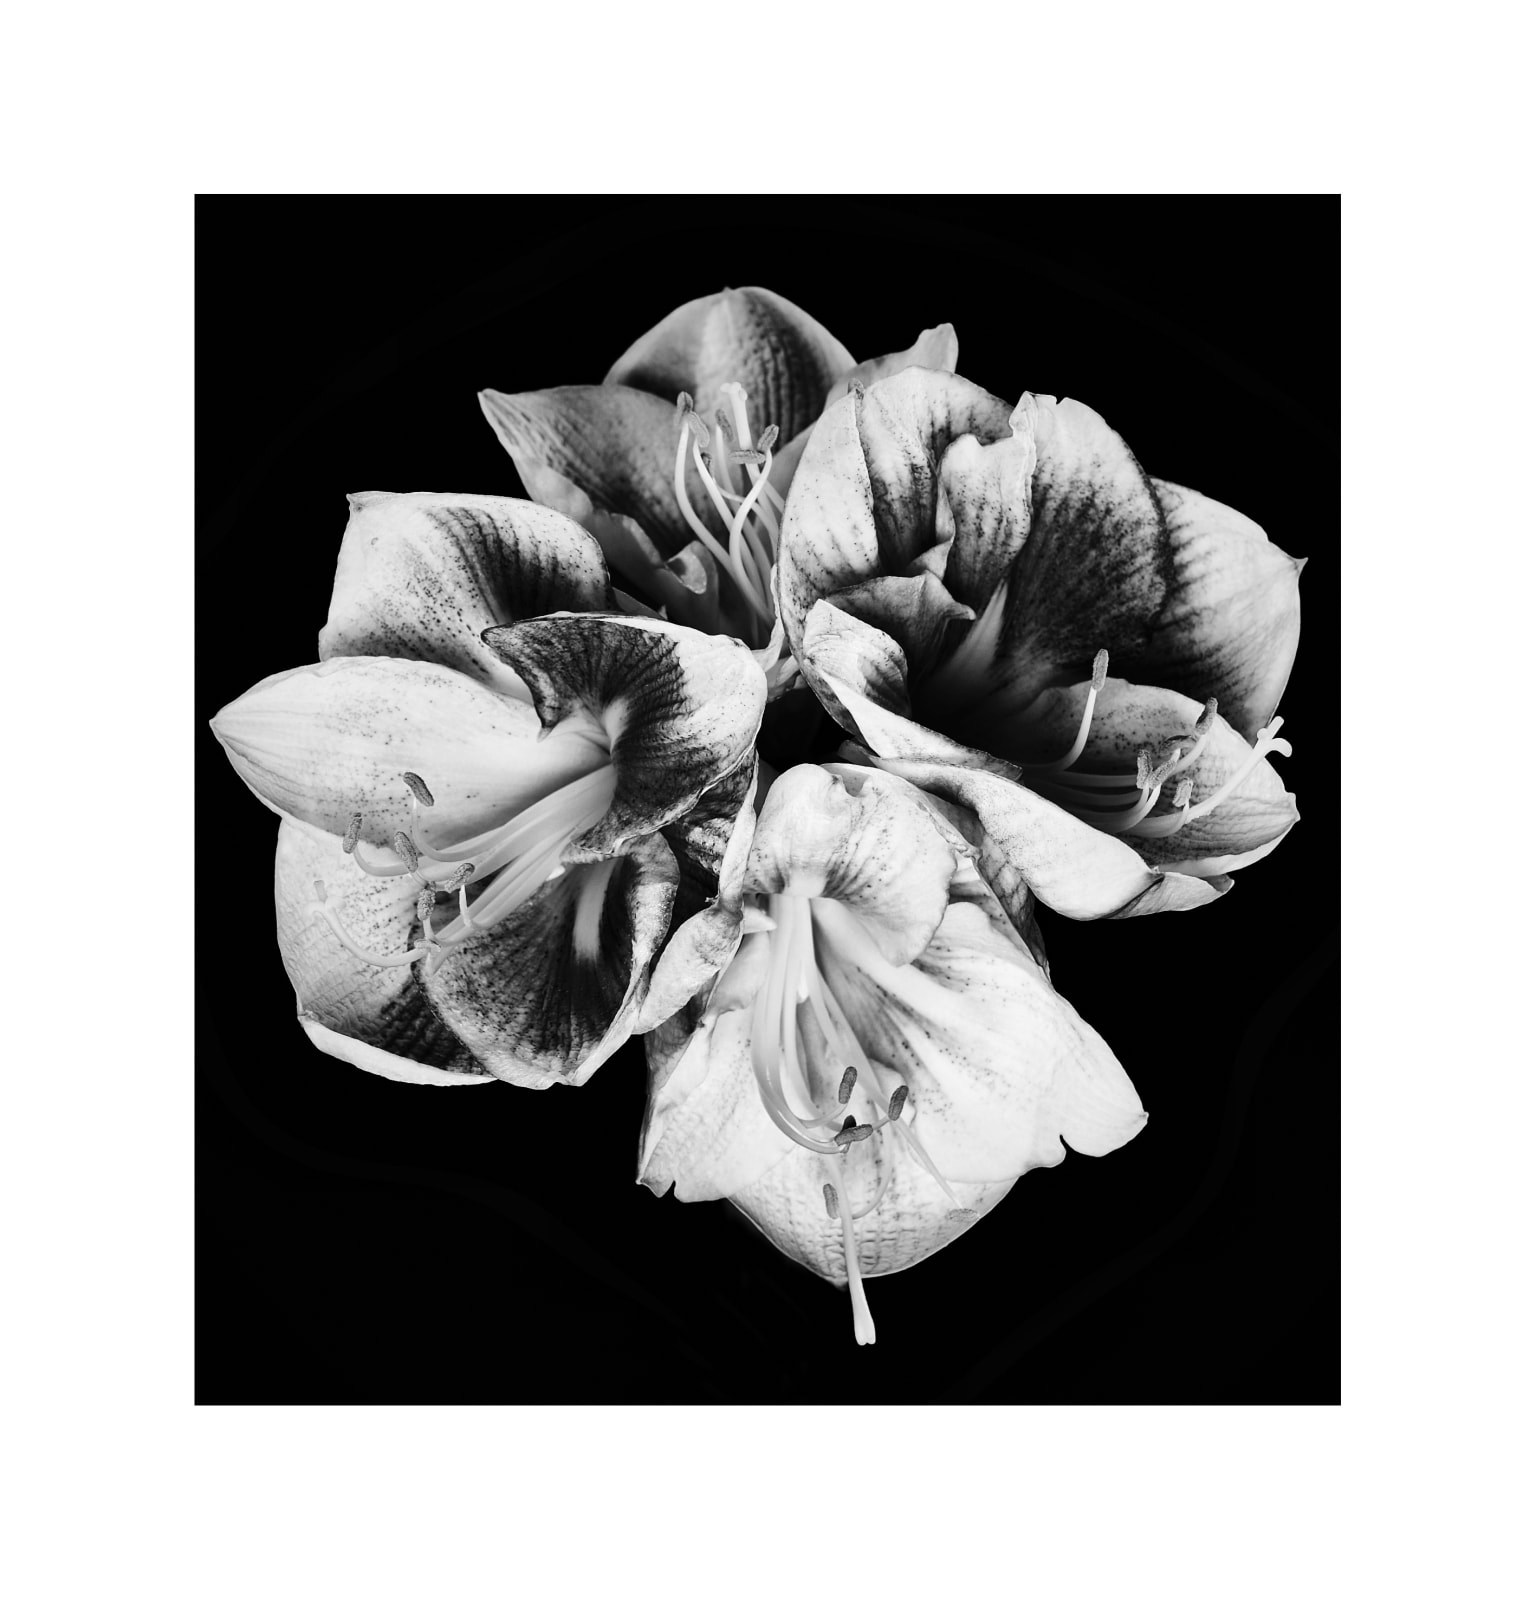 Almin Zrno, Flower 3, 2019